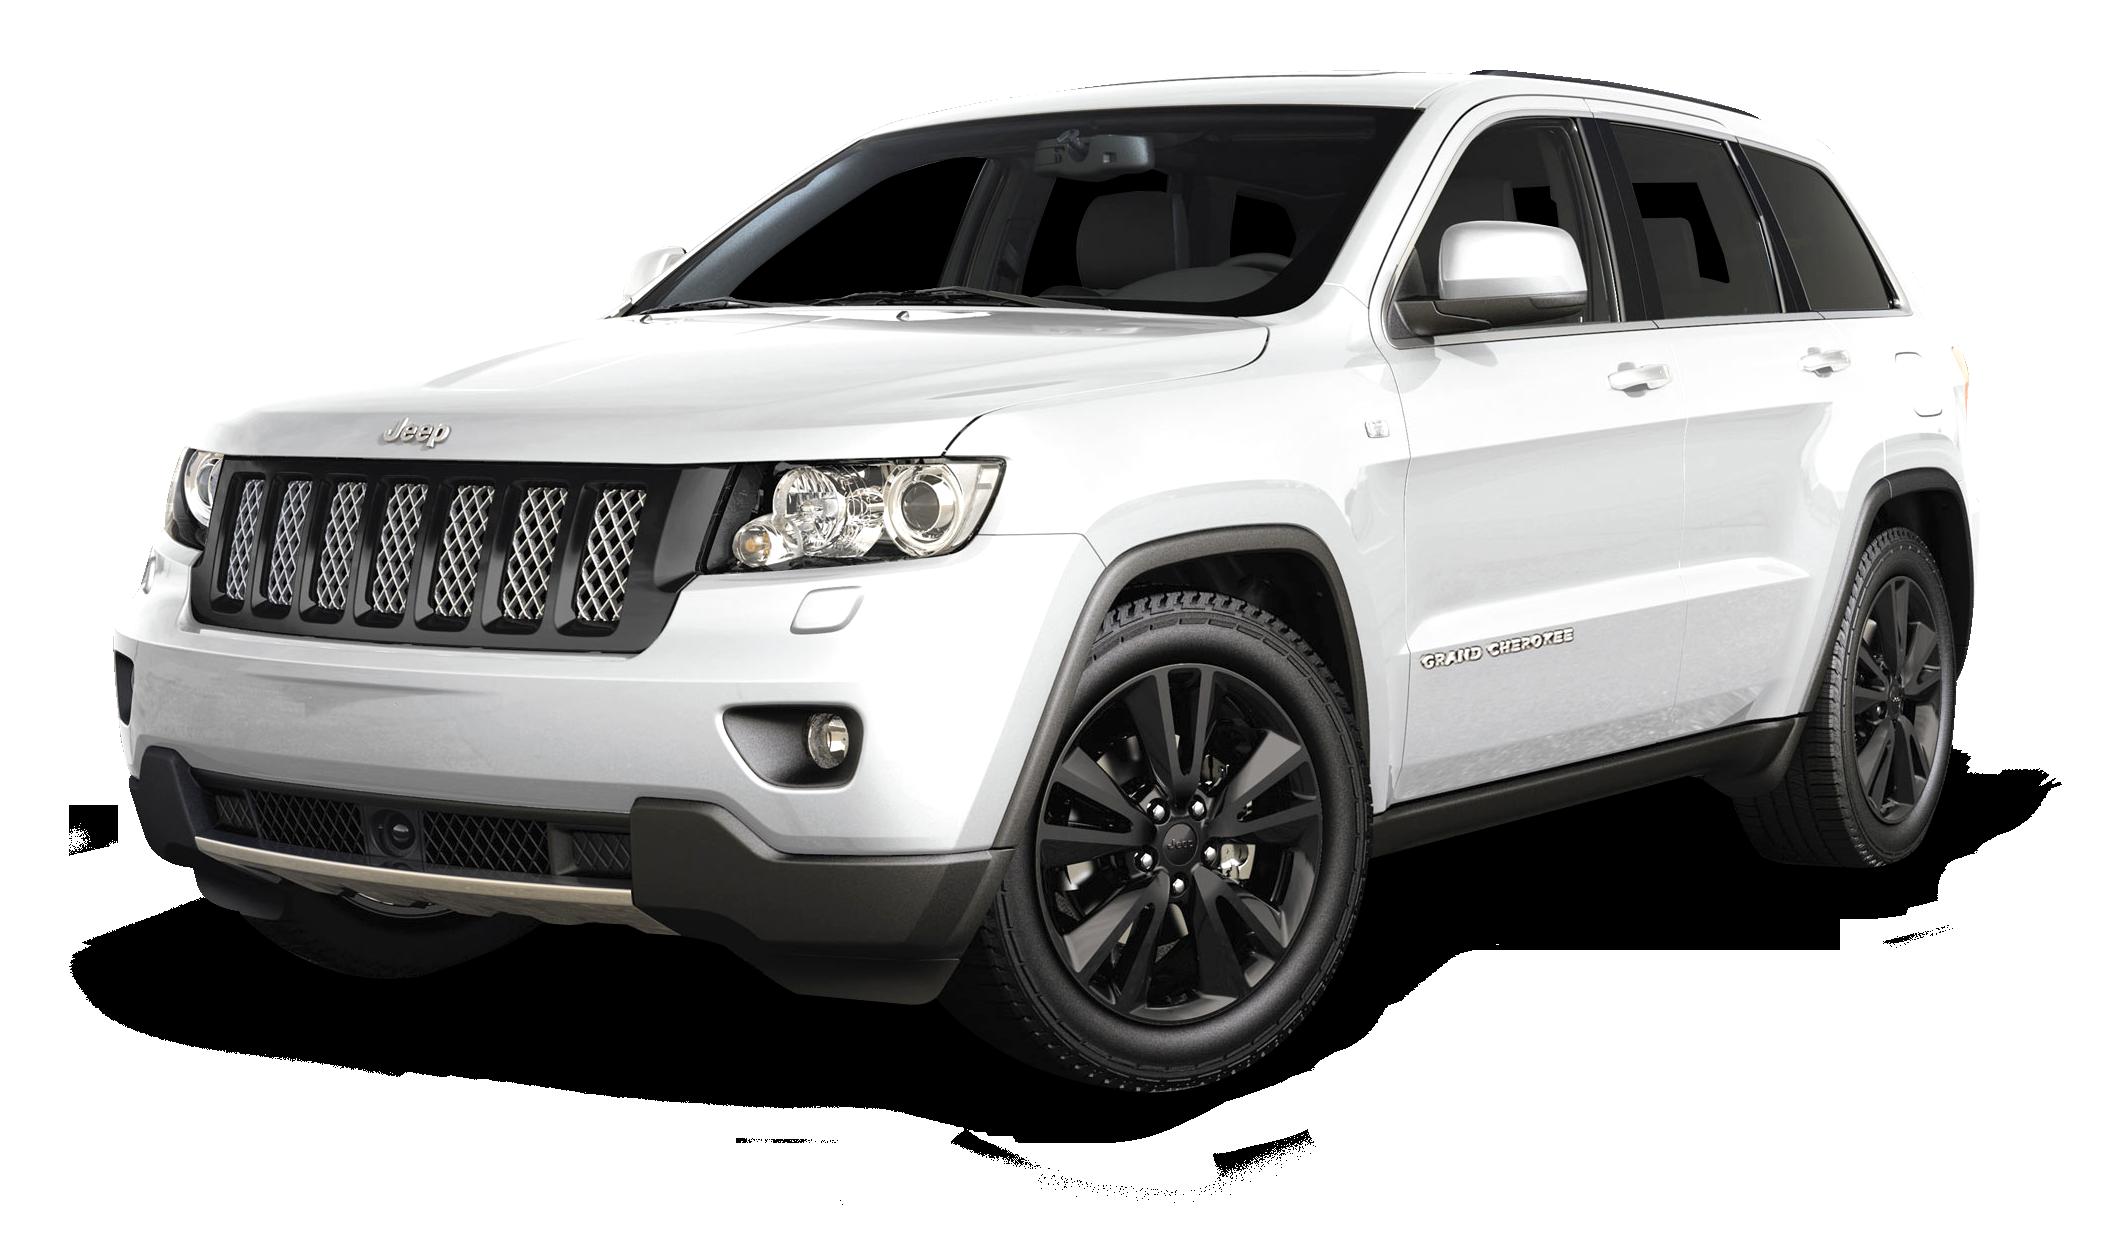 chrysler-jeep-grand-cherokee